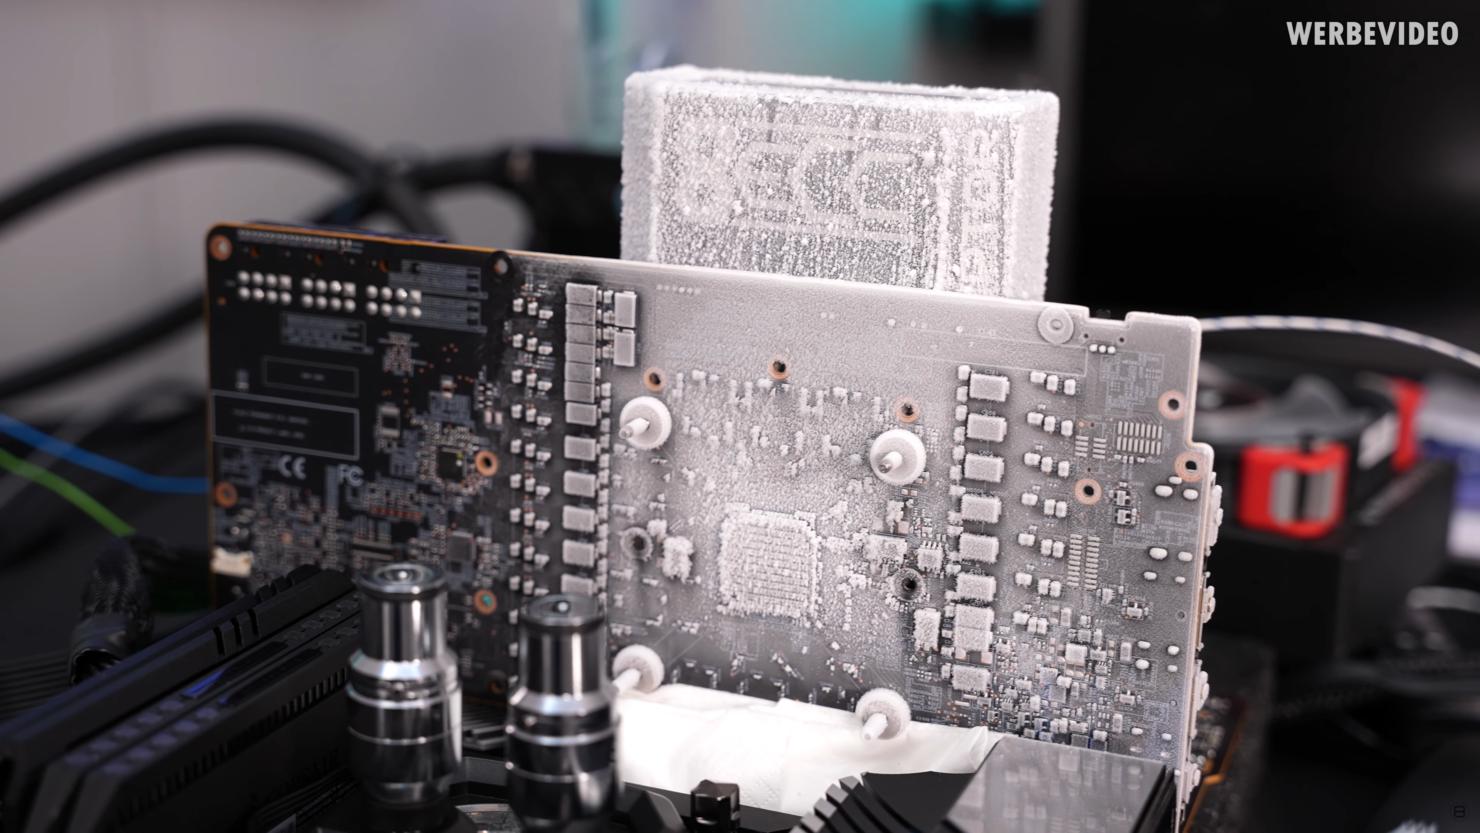 AMD Big Navi 21 XTXH on PowerColor Radeon RX 6900 XT Liquid Devil Ultimate Achieves 3.2 GHz GPU Frequency World Record